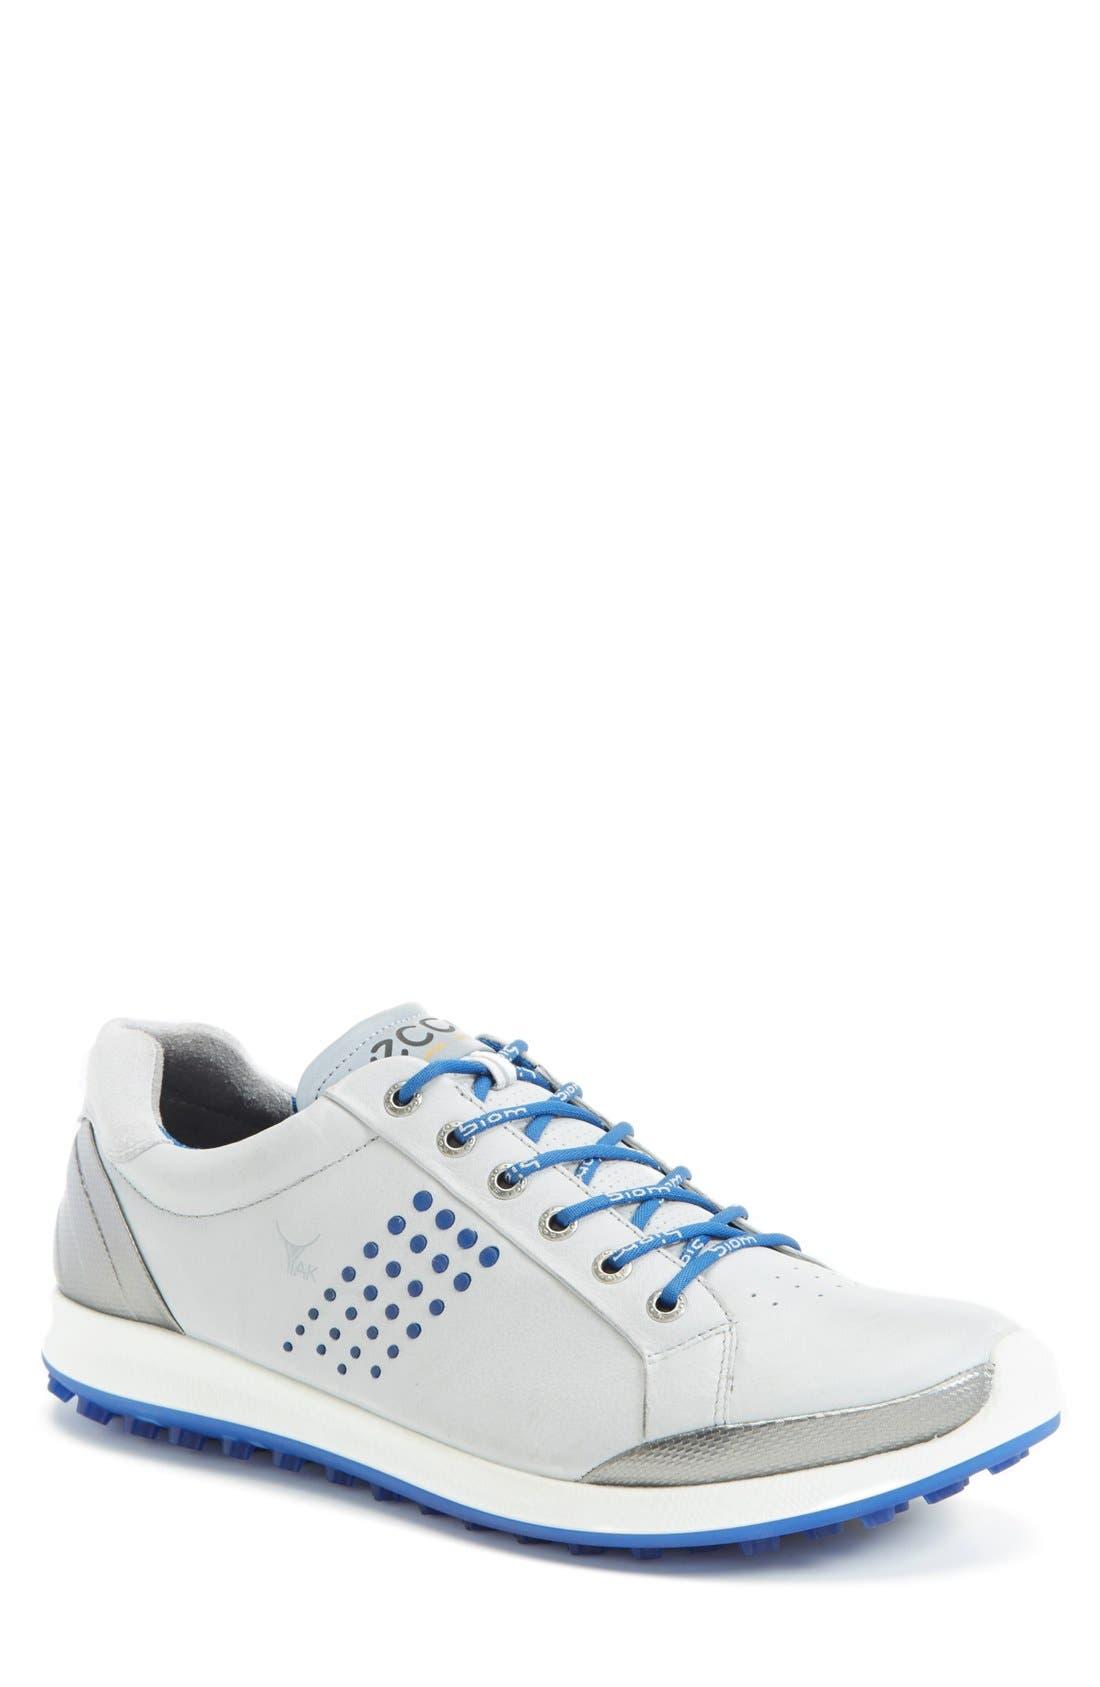 BIOM Hybrid 2 Golf Shoe,                         Main,                         color, Concrete/ Royal